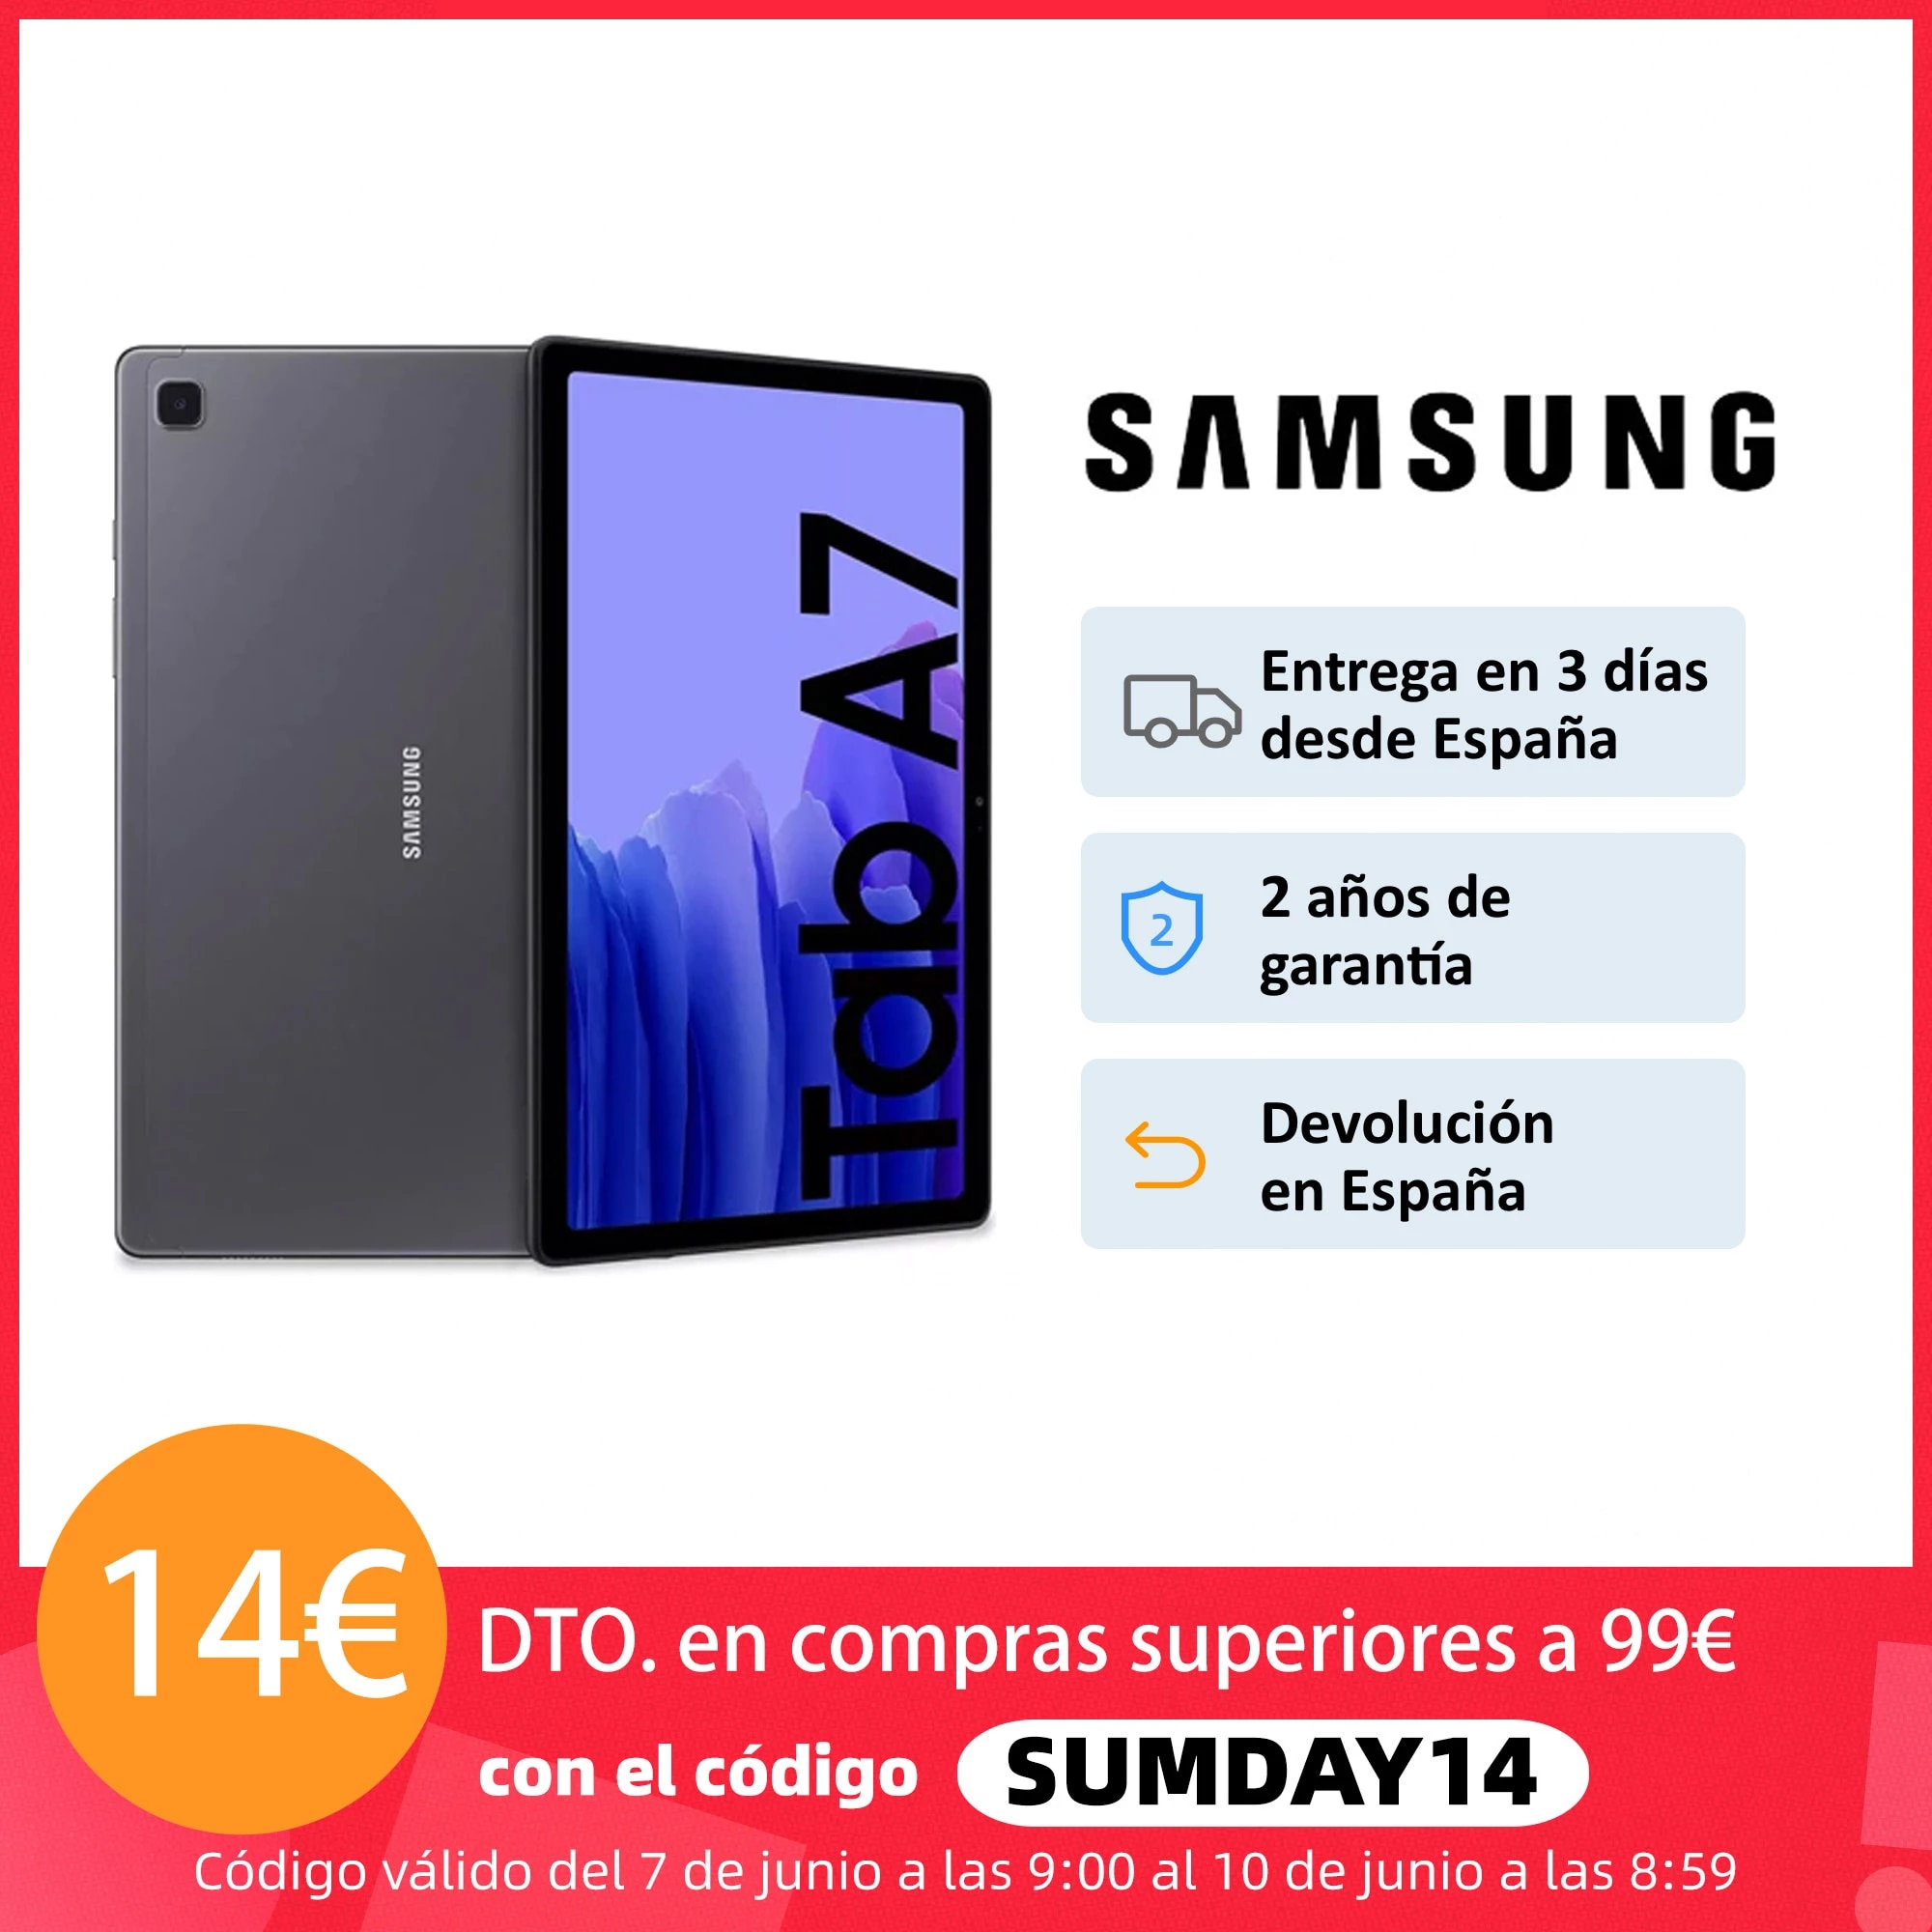 Tablet SAMSUNG Galaxy Tab A7 WiFi/4G TFT 10.4 «WUXGA +, 3GB + 32/64GB (expandable with MicroSD), 7040mAh, 4 speakers»